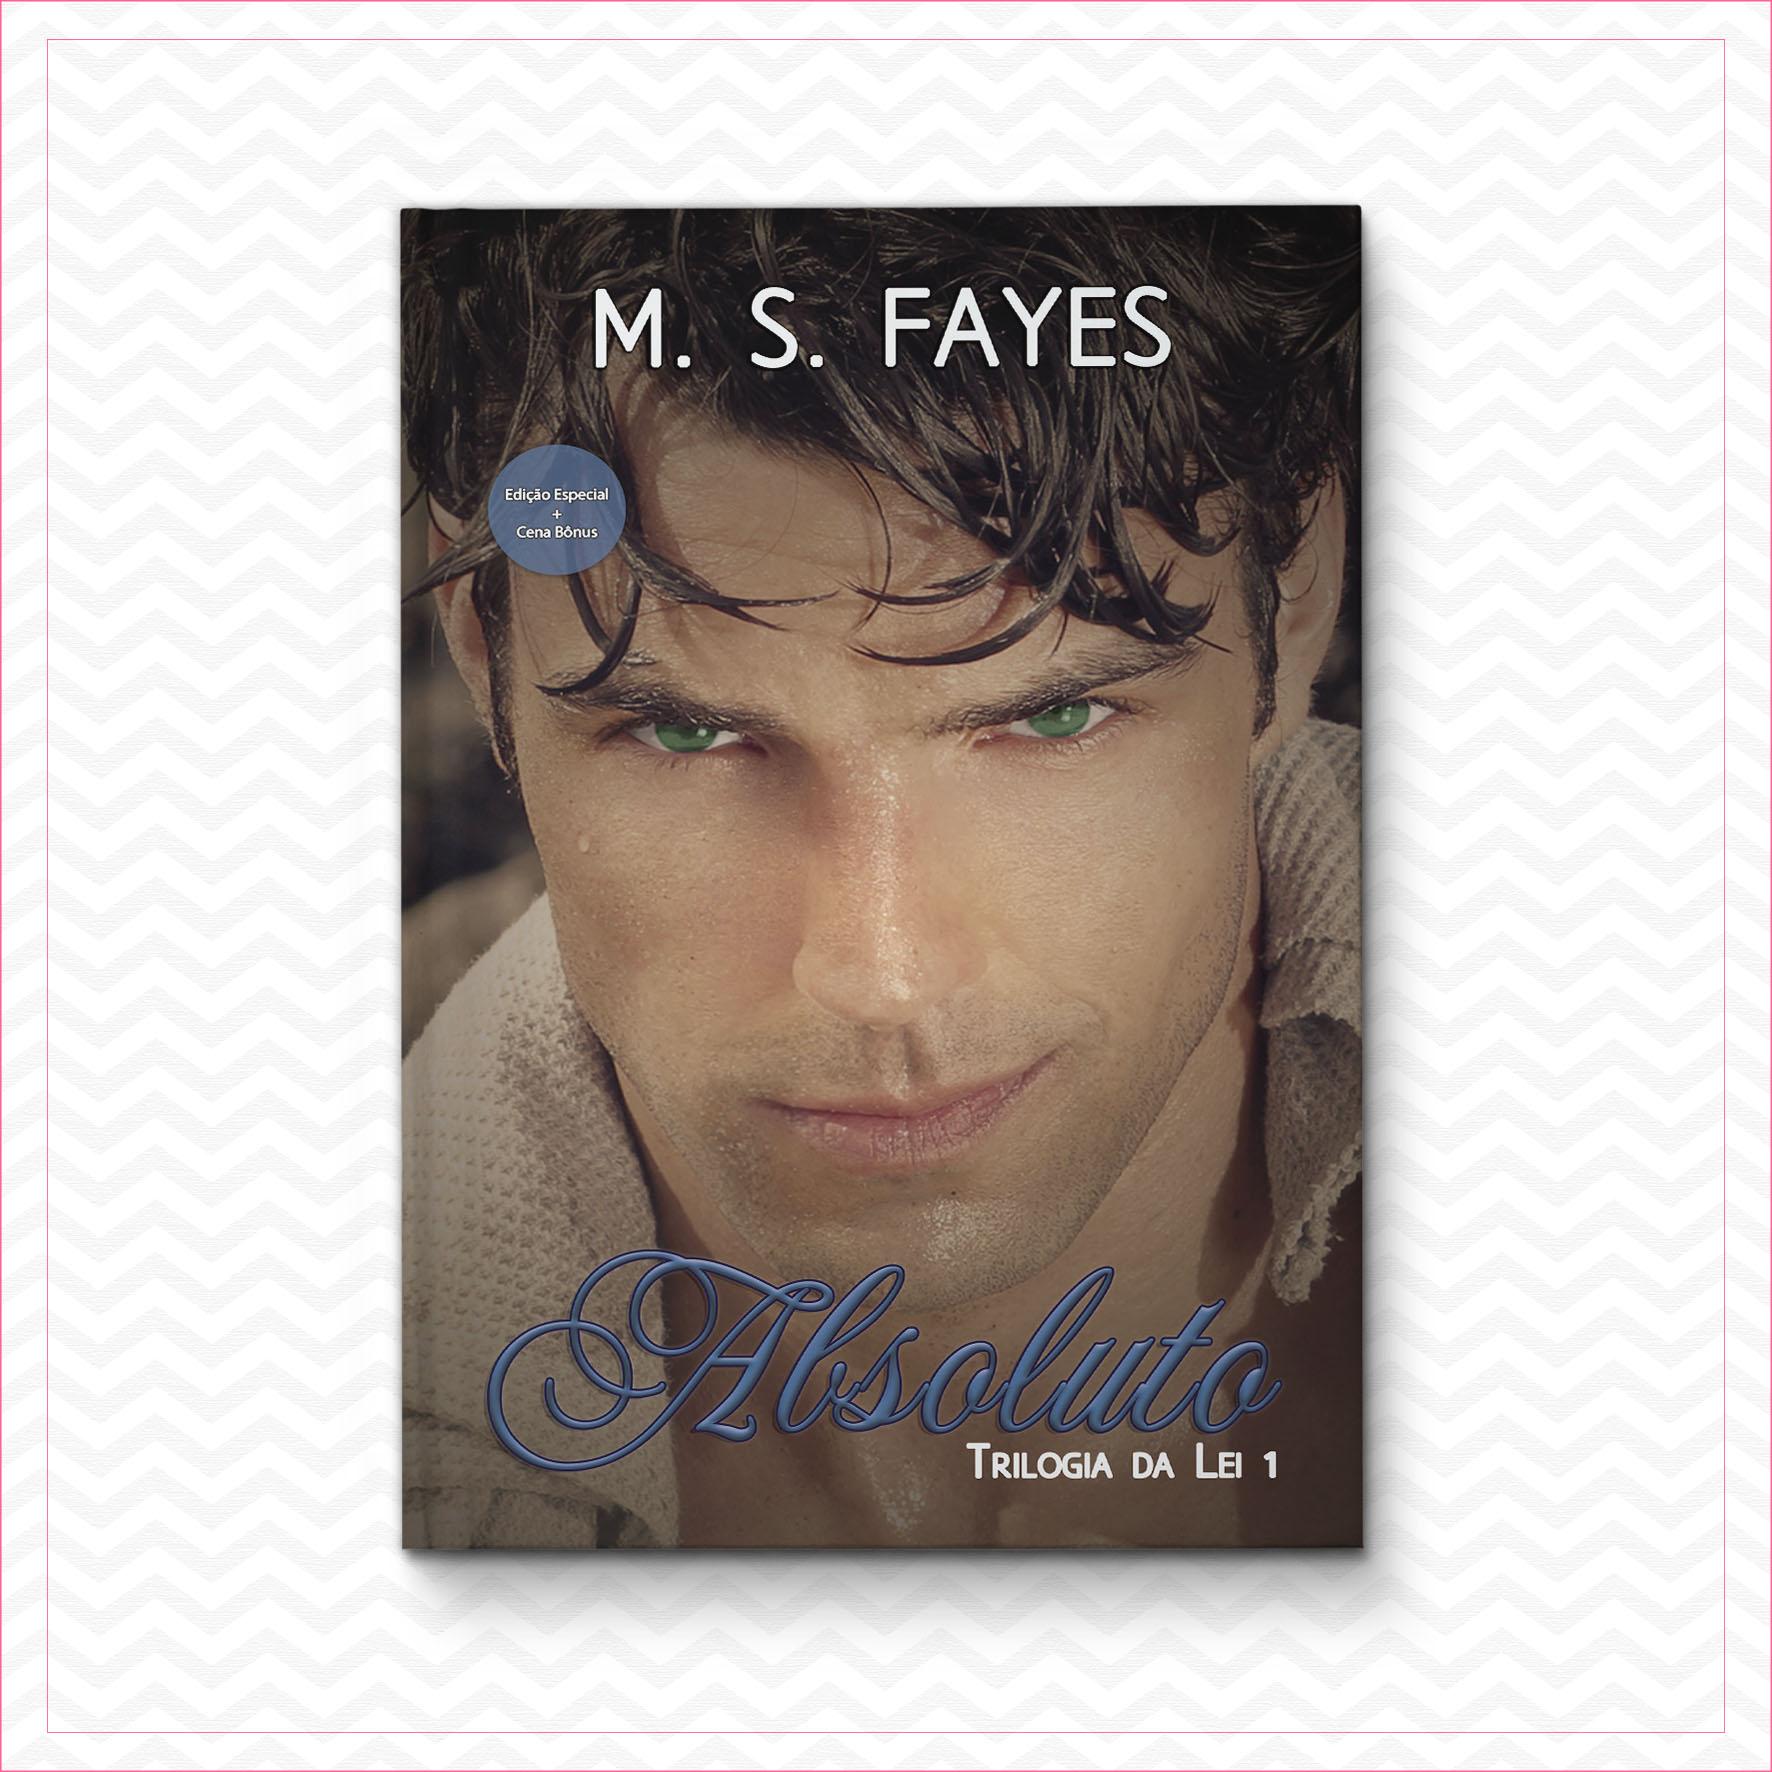 Absoluto – Trilogia da Lei 1 – M. S. Fayes